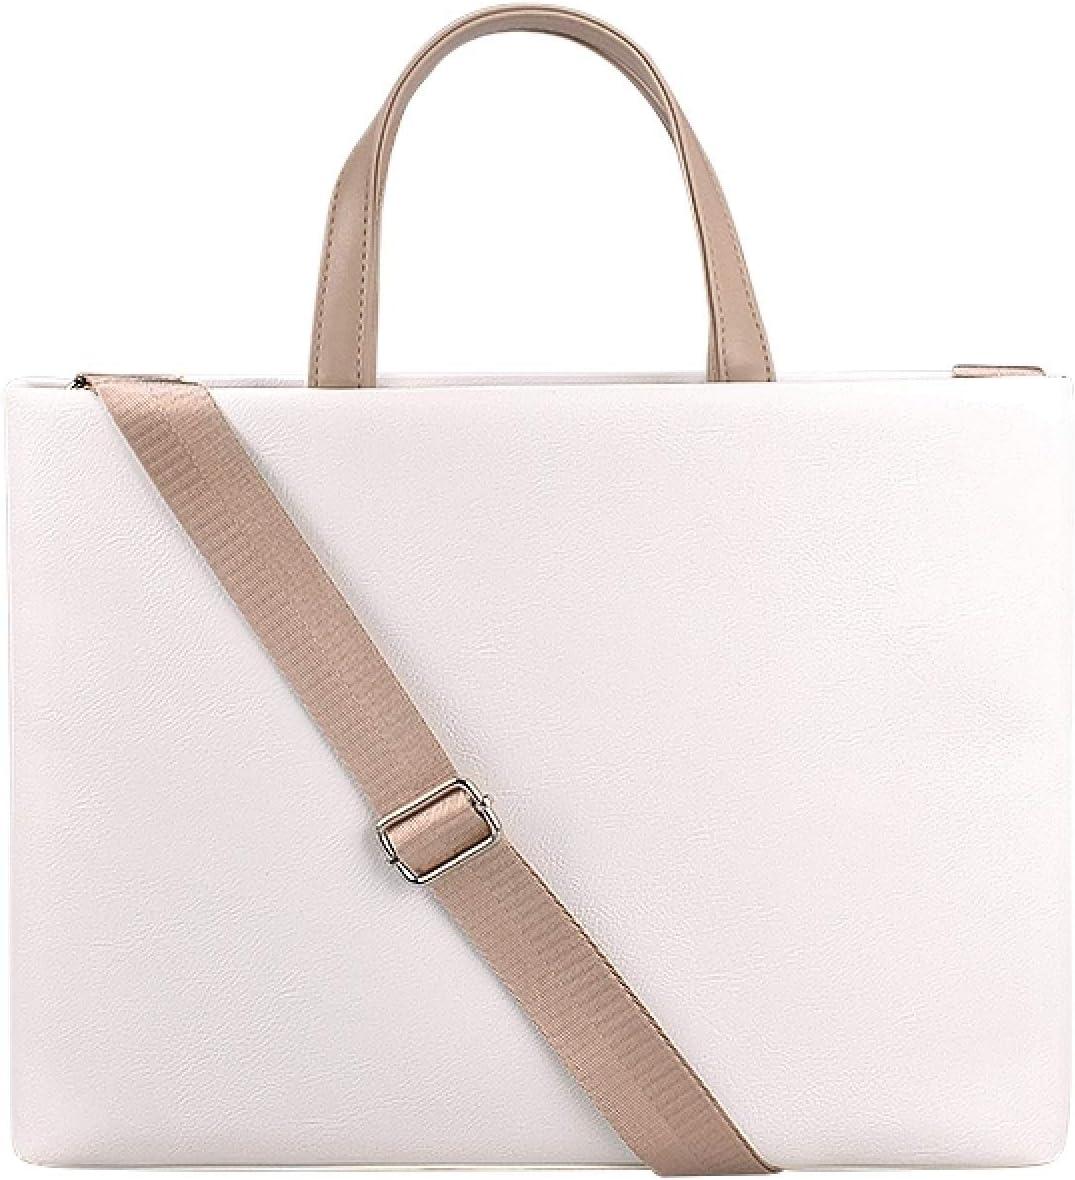 CAOMING PU Waterproof Laptop Topics on TV Regular store Handbag Crossbody Bag for 13.3 inch